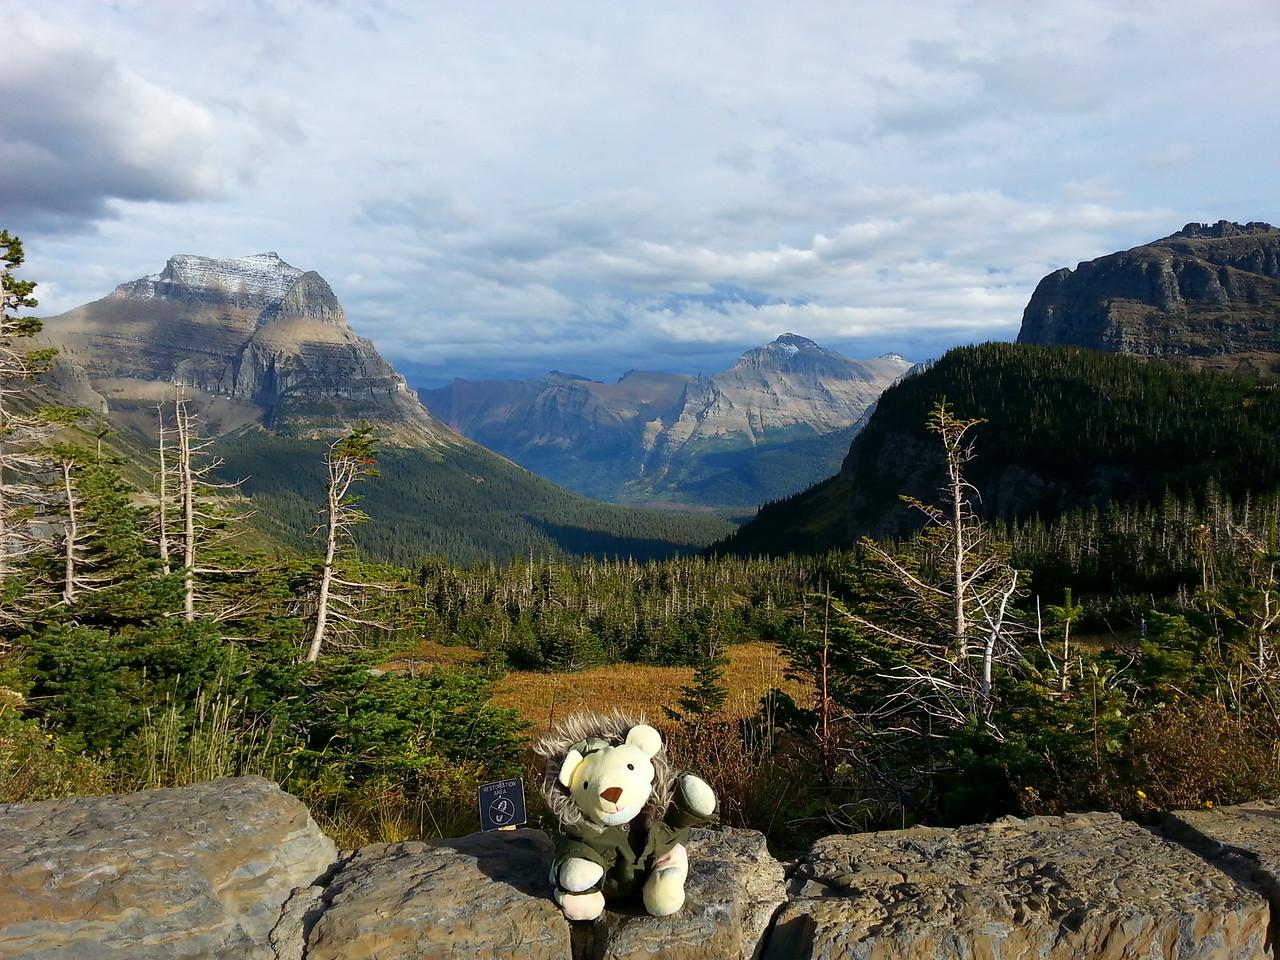 Logan Pass Visitor Center Overlook Glacier National Park